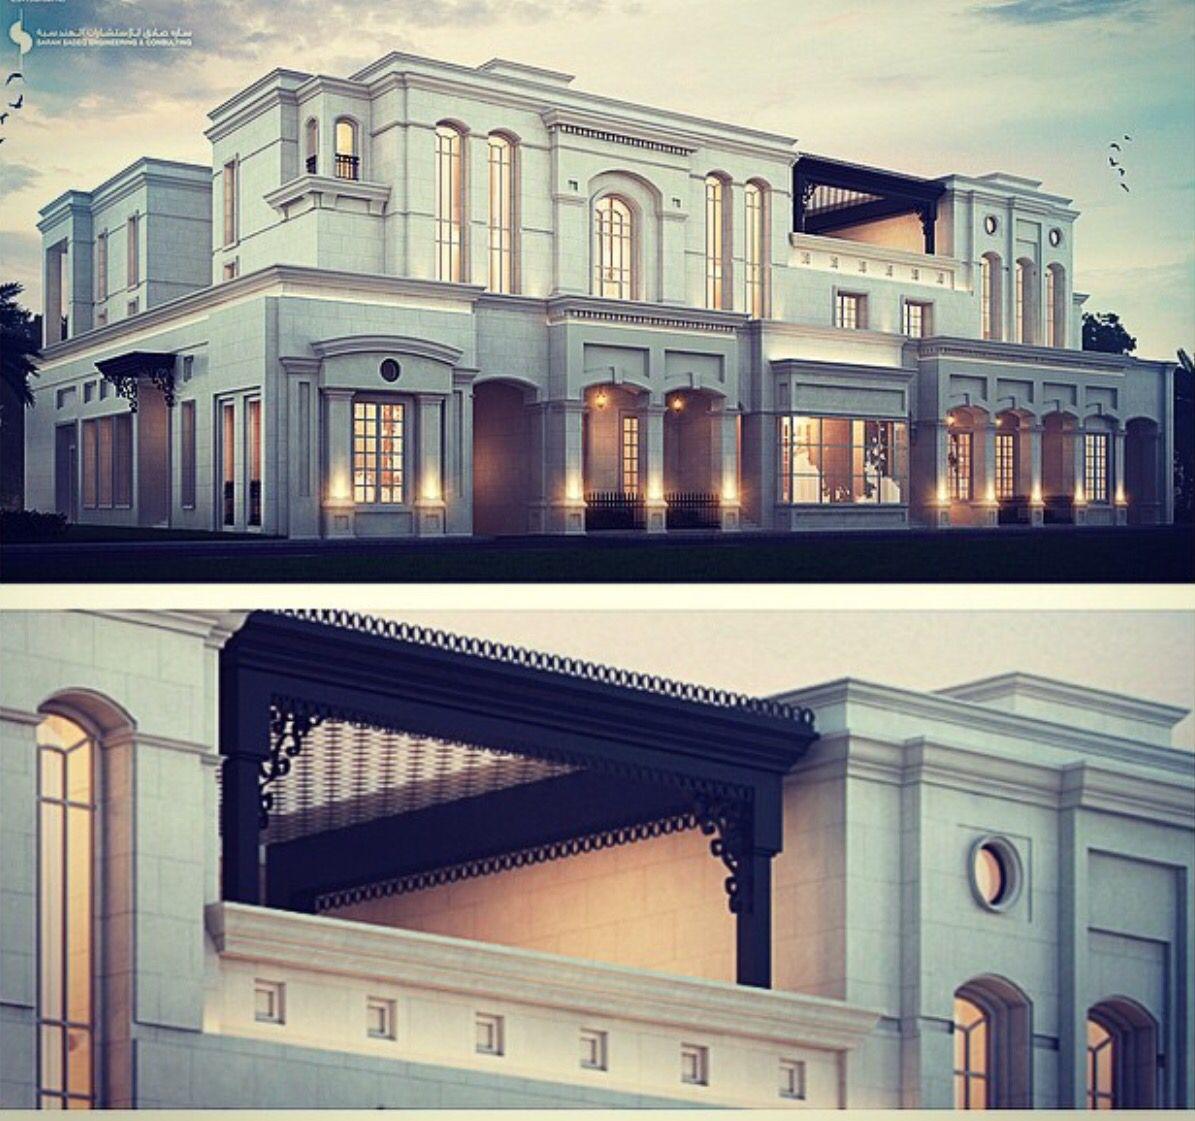 2000 m classic private villa kuwait sarah sadeq architects sarah sadeq architectes pinterest. Black Bedroom Furniture Sets. Home Design Ideas